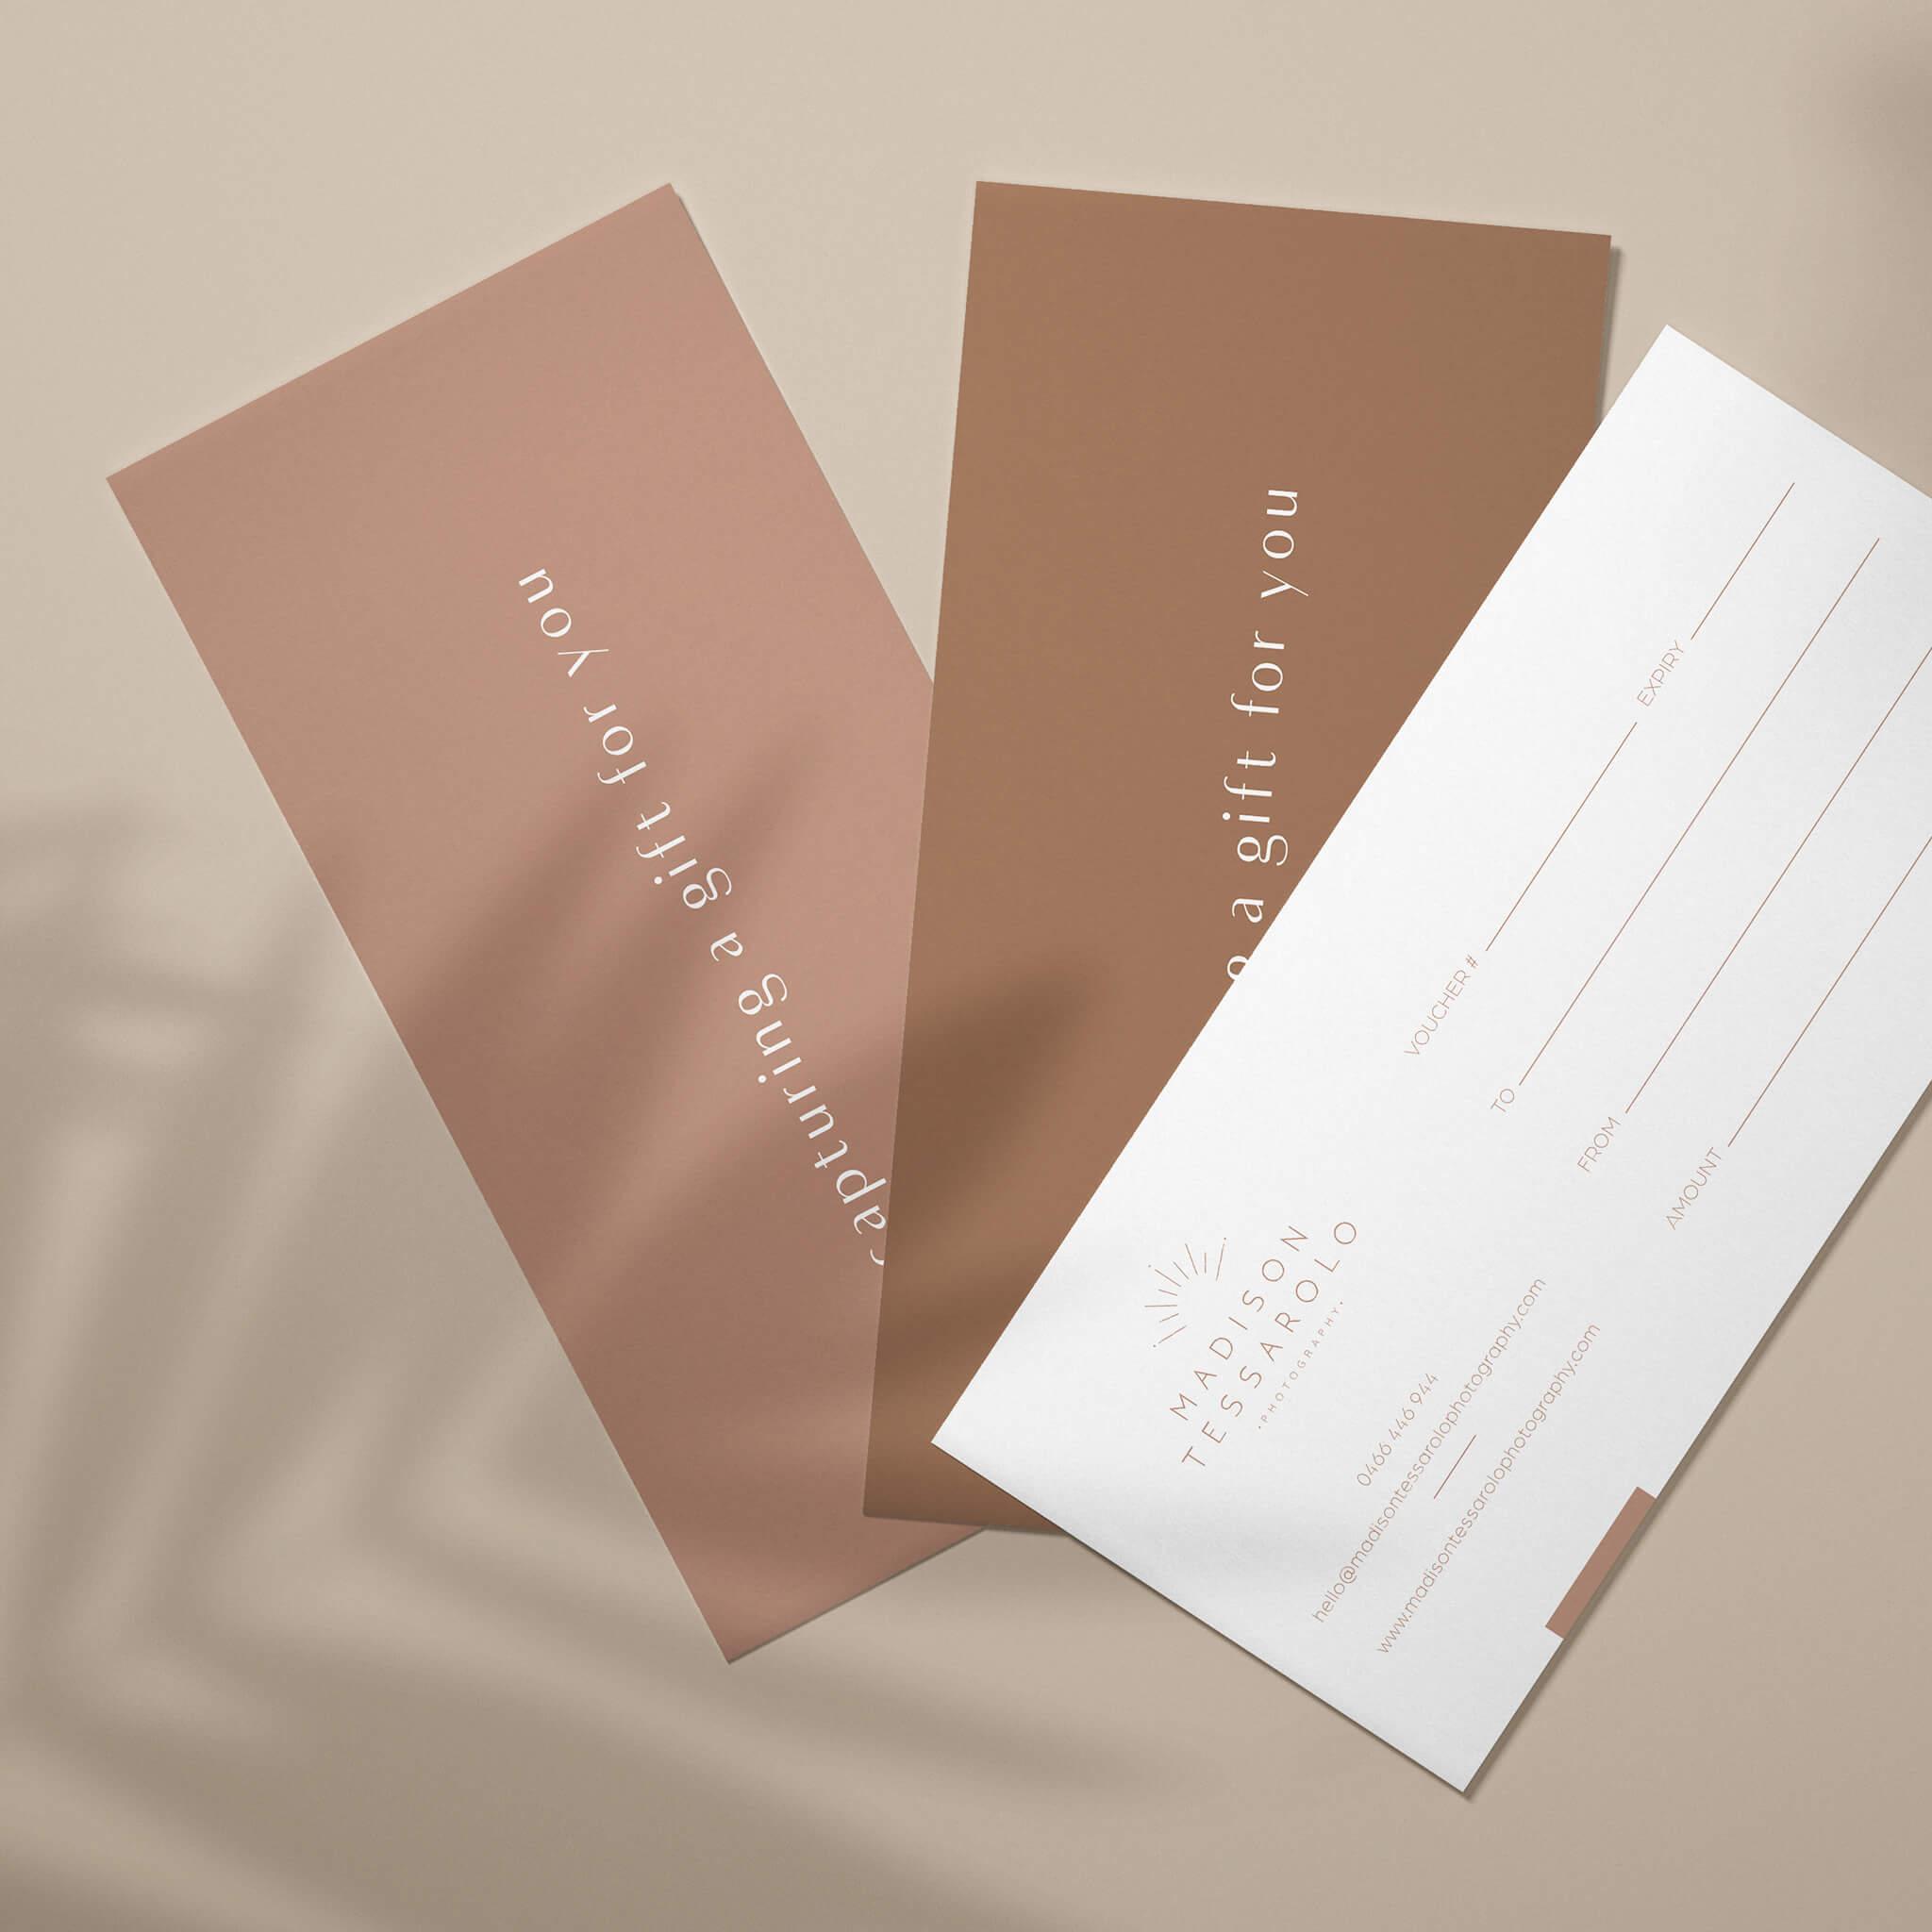 https://zanandcocreative.com.au/wp-content/uploads/2020/12/Madi-Tess-Gift-Voucher-Design.jpg